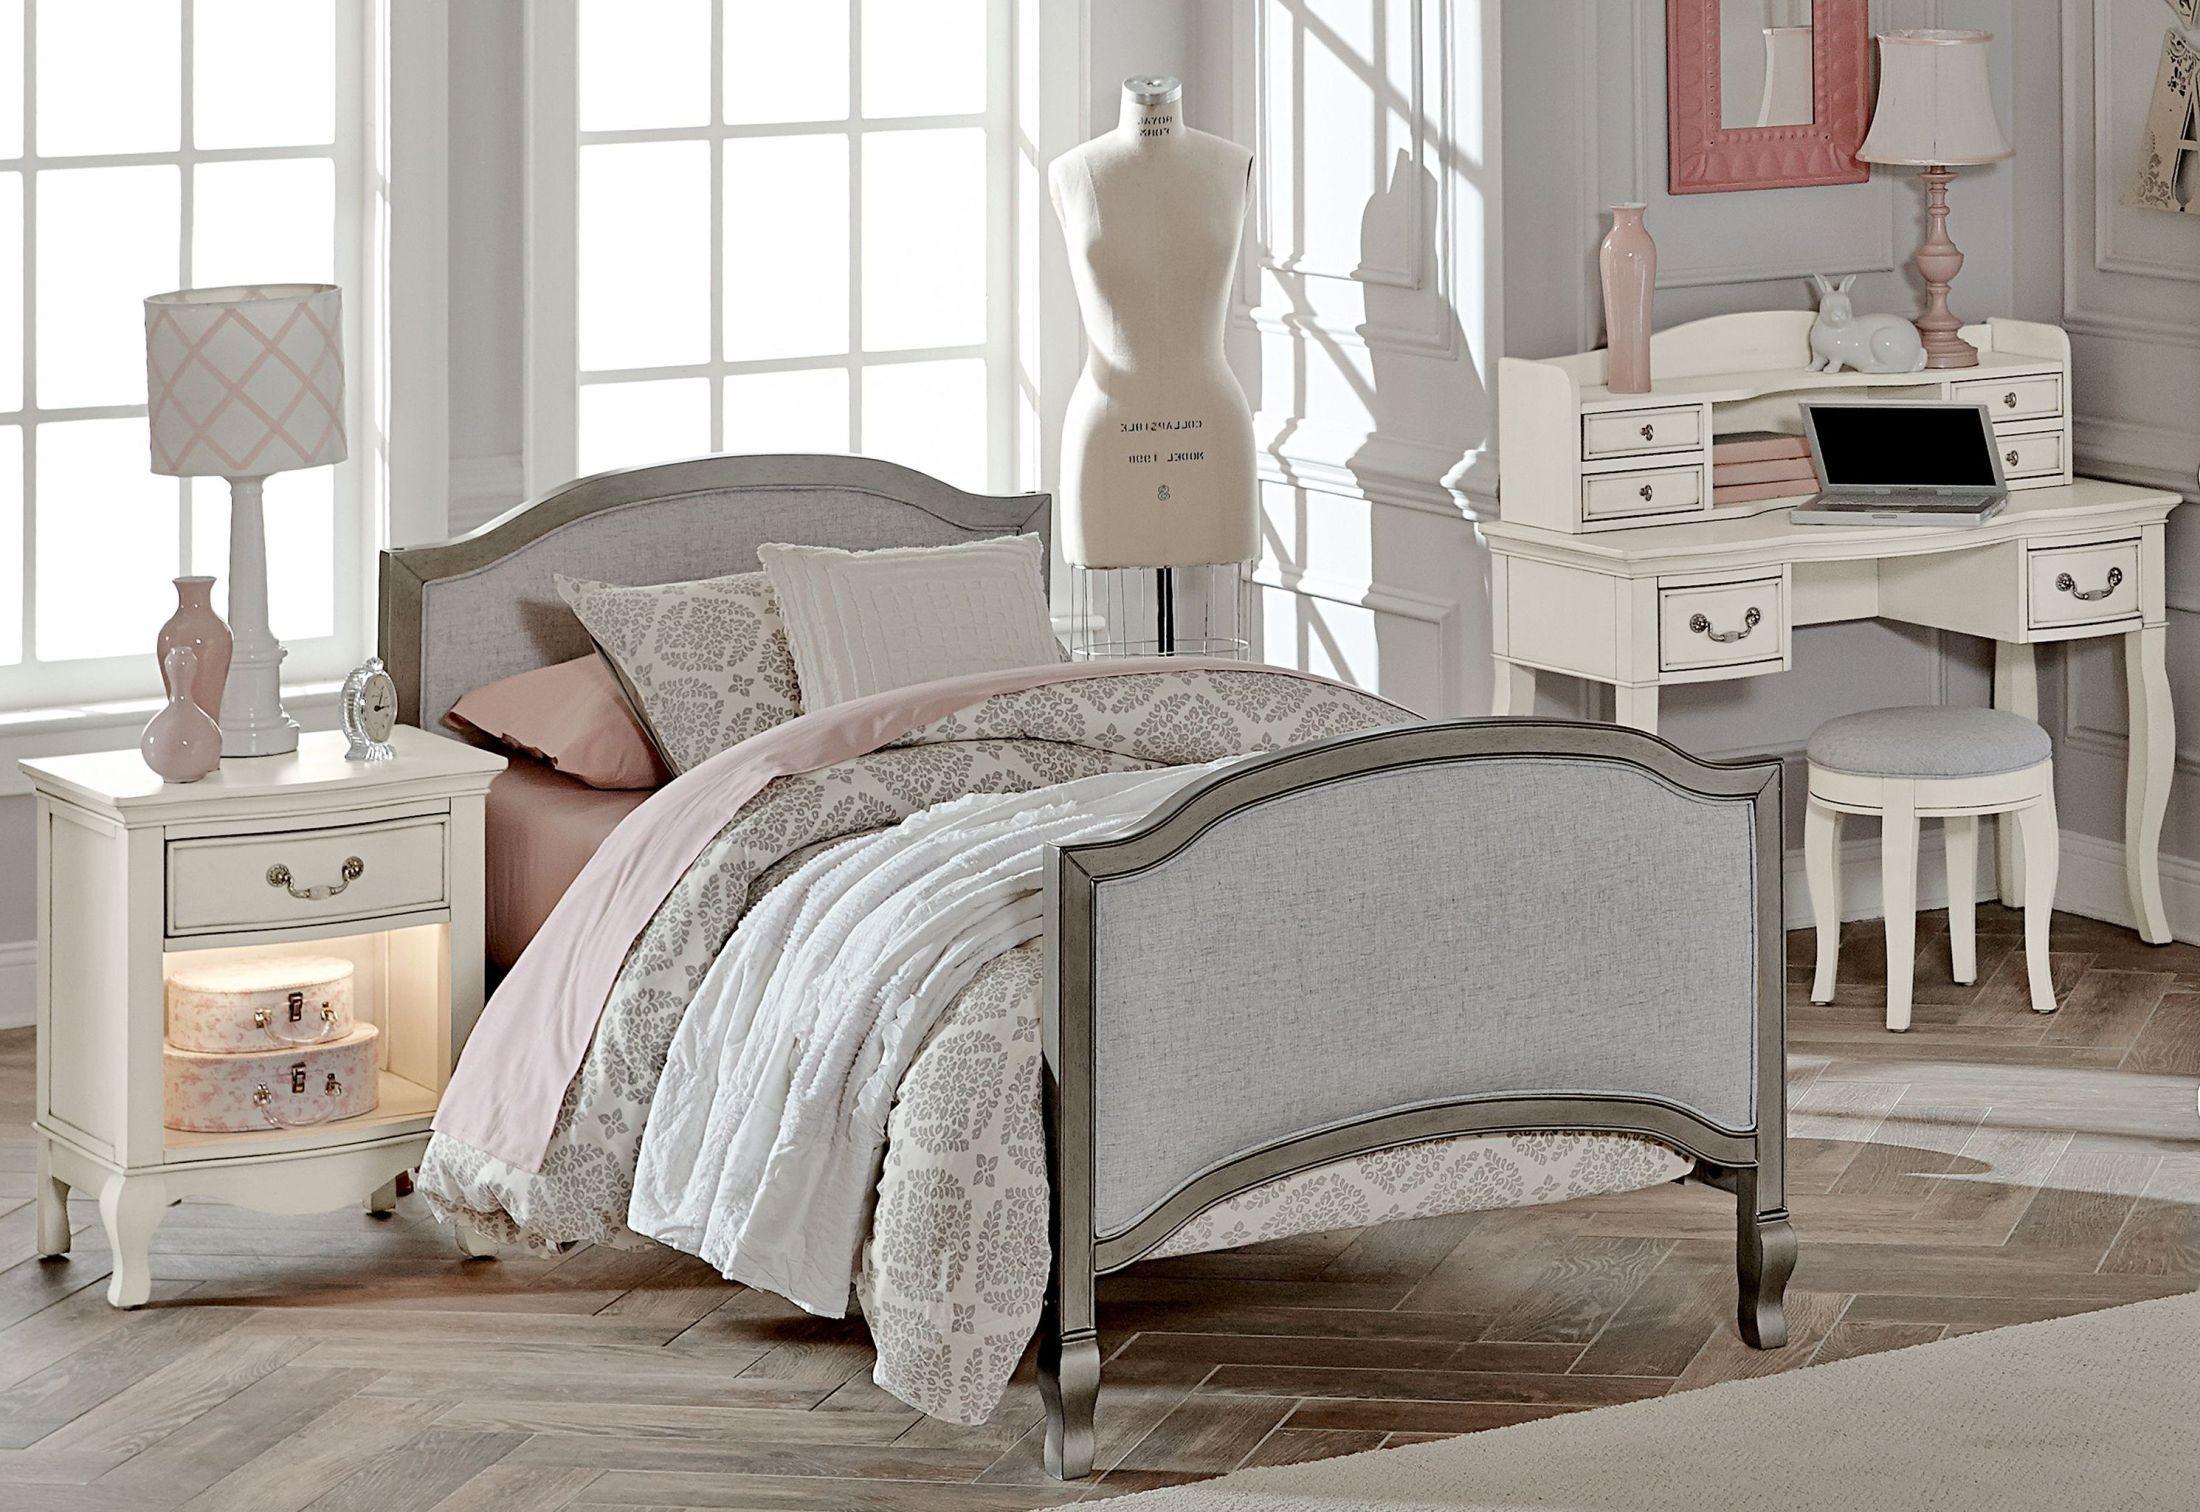 Genial Kensington Antique Silver Victoria Youth Panel Bedroom Set From NE Kids |  Coleman Furniture